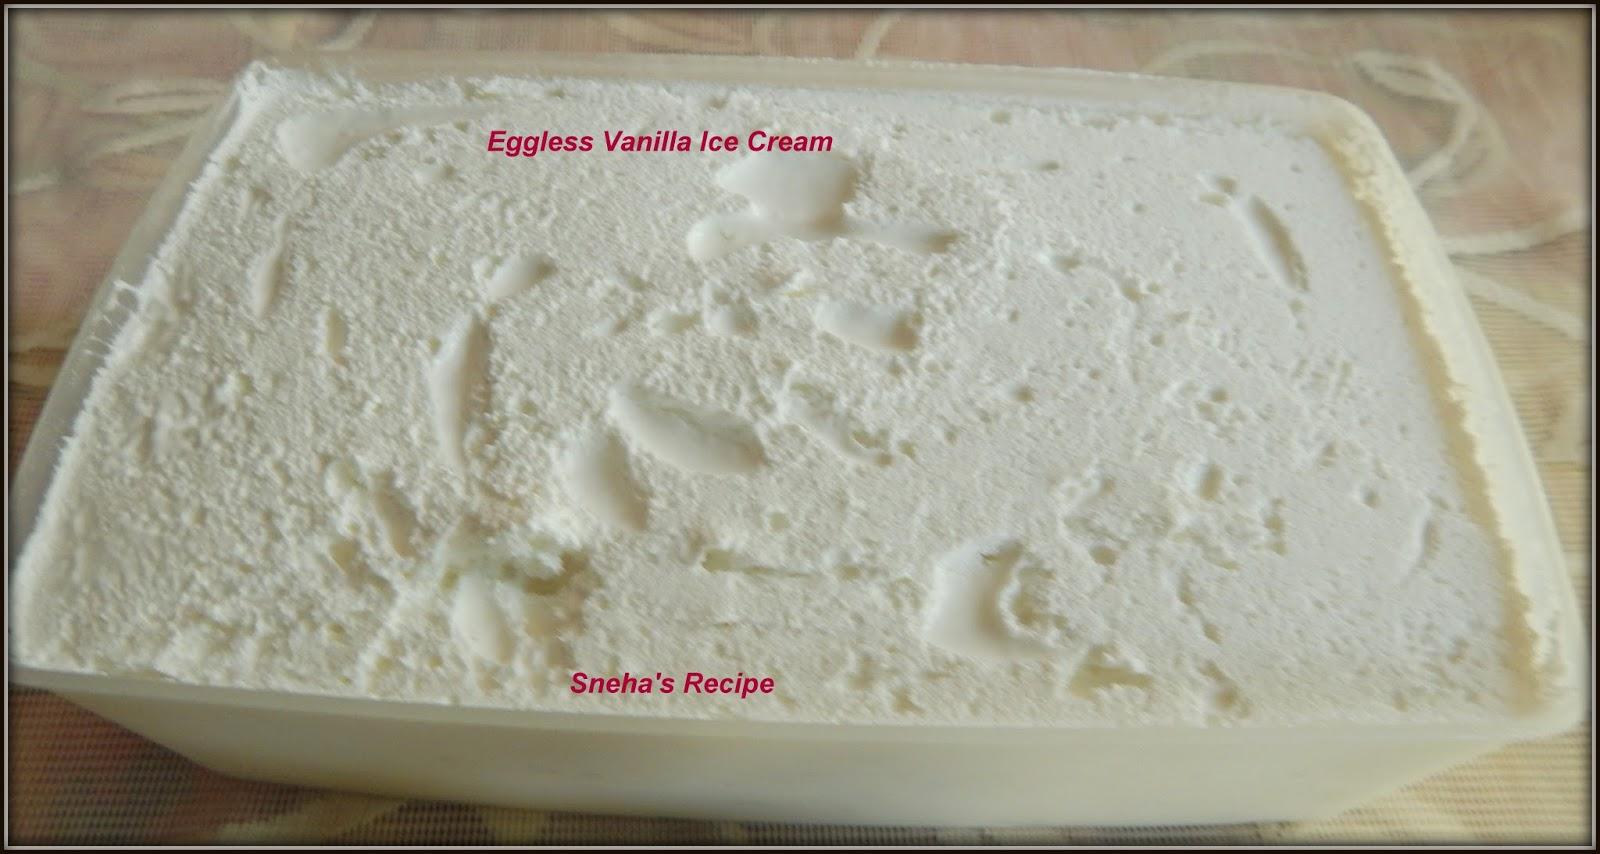 Eggless vanilla ice cream maker recipes